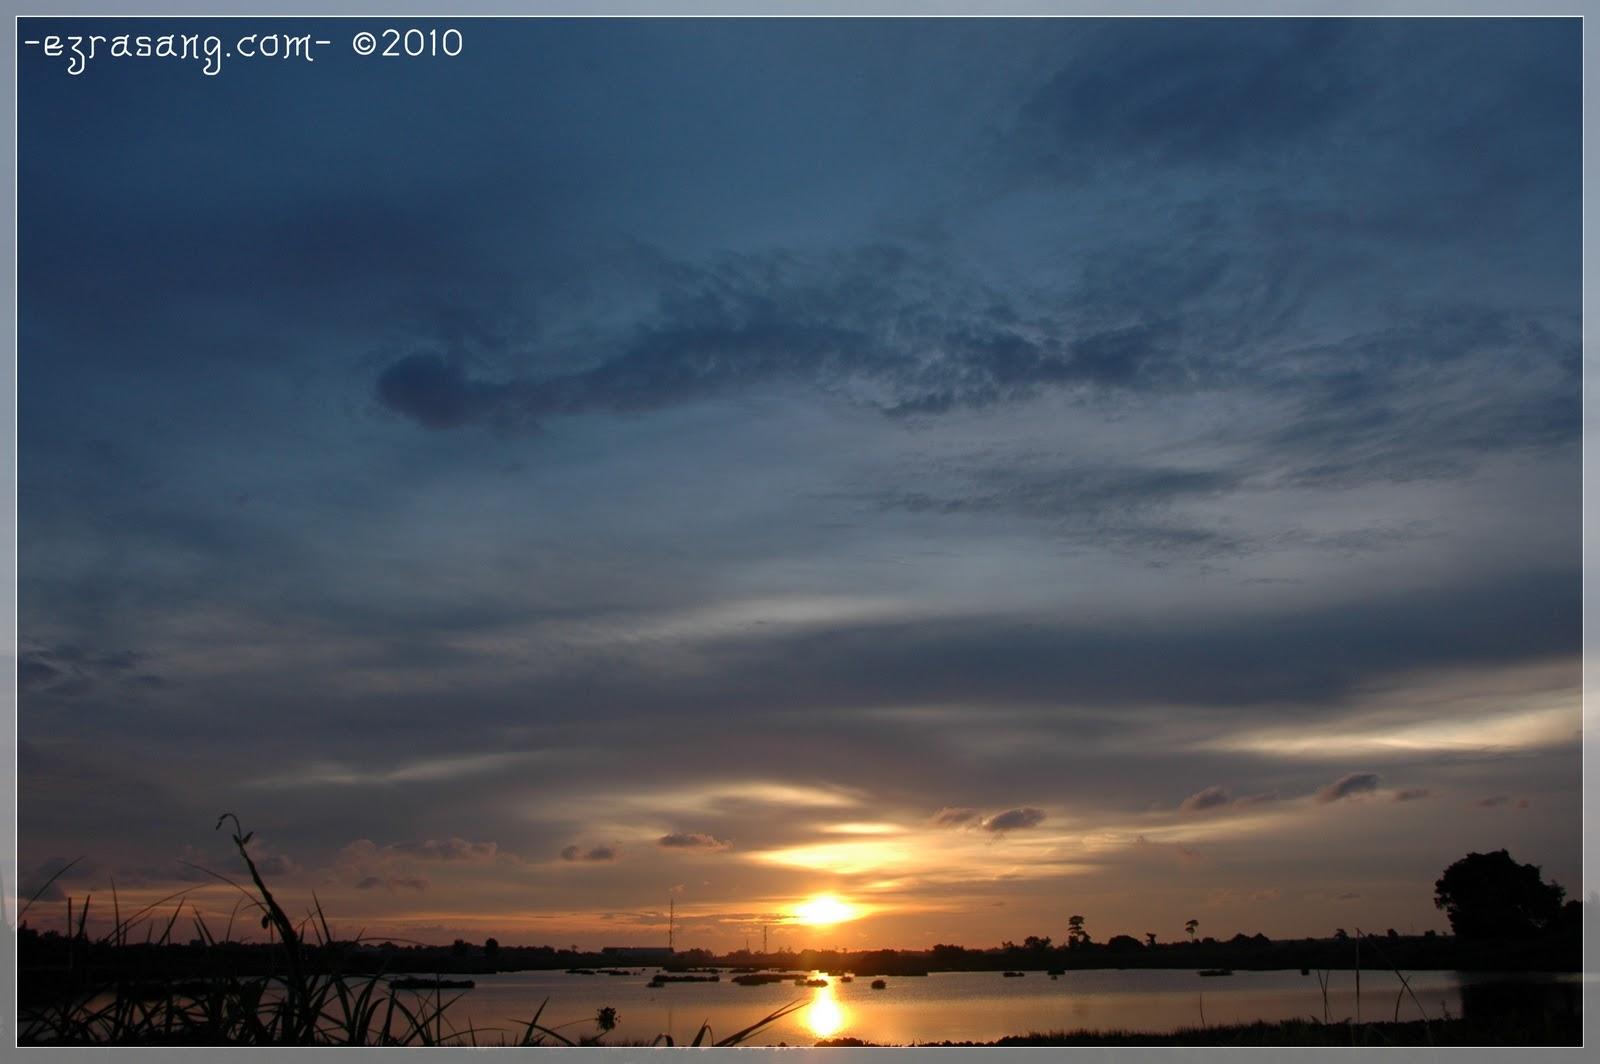 Interestingly, sunset!